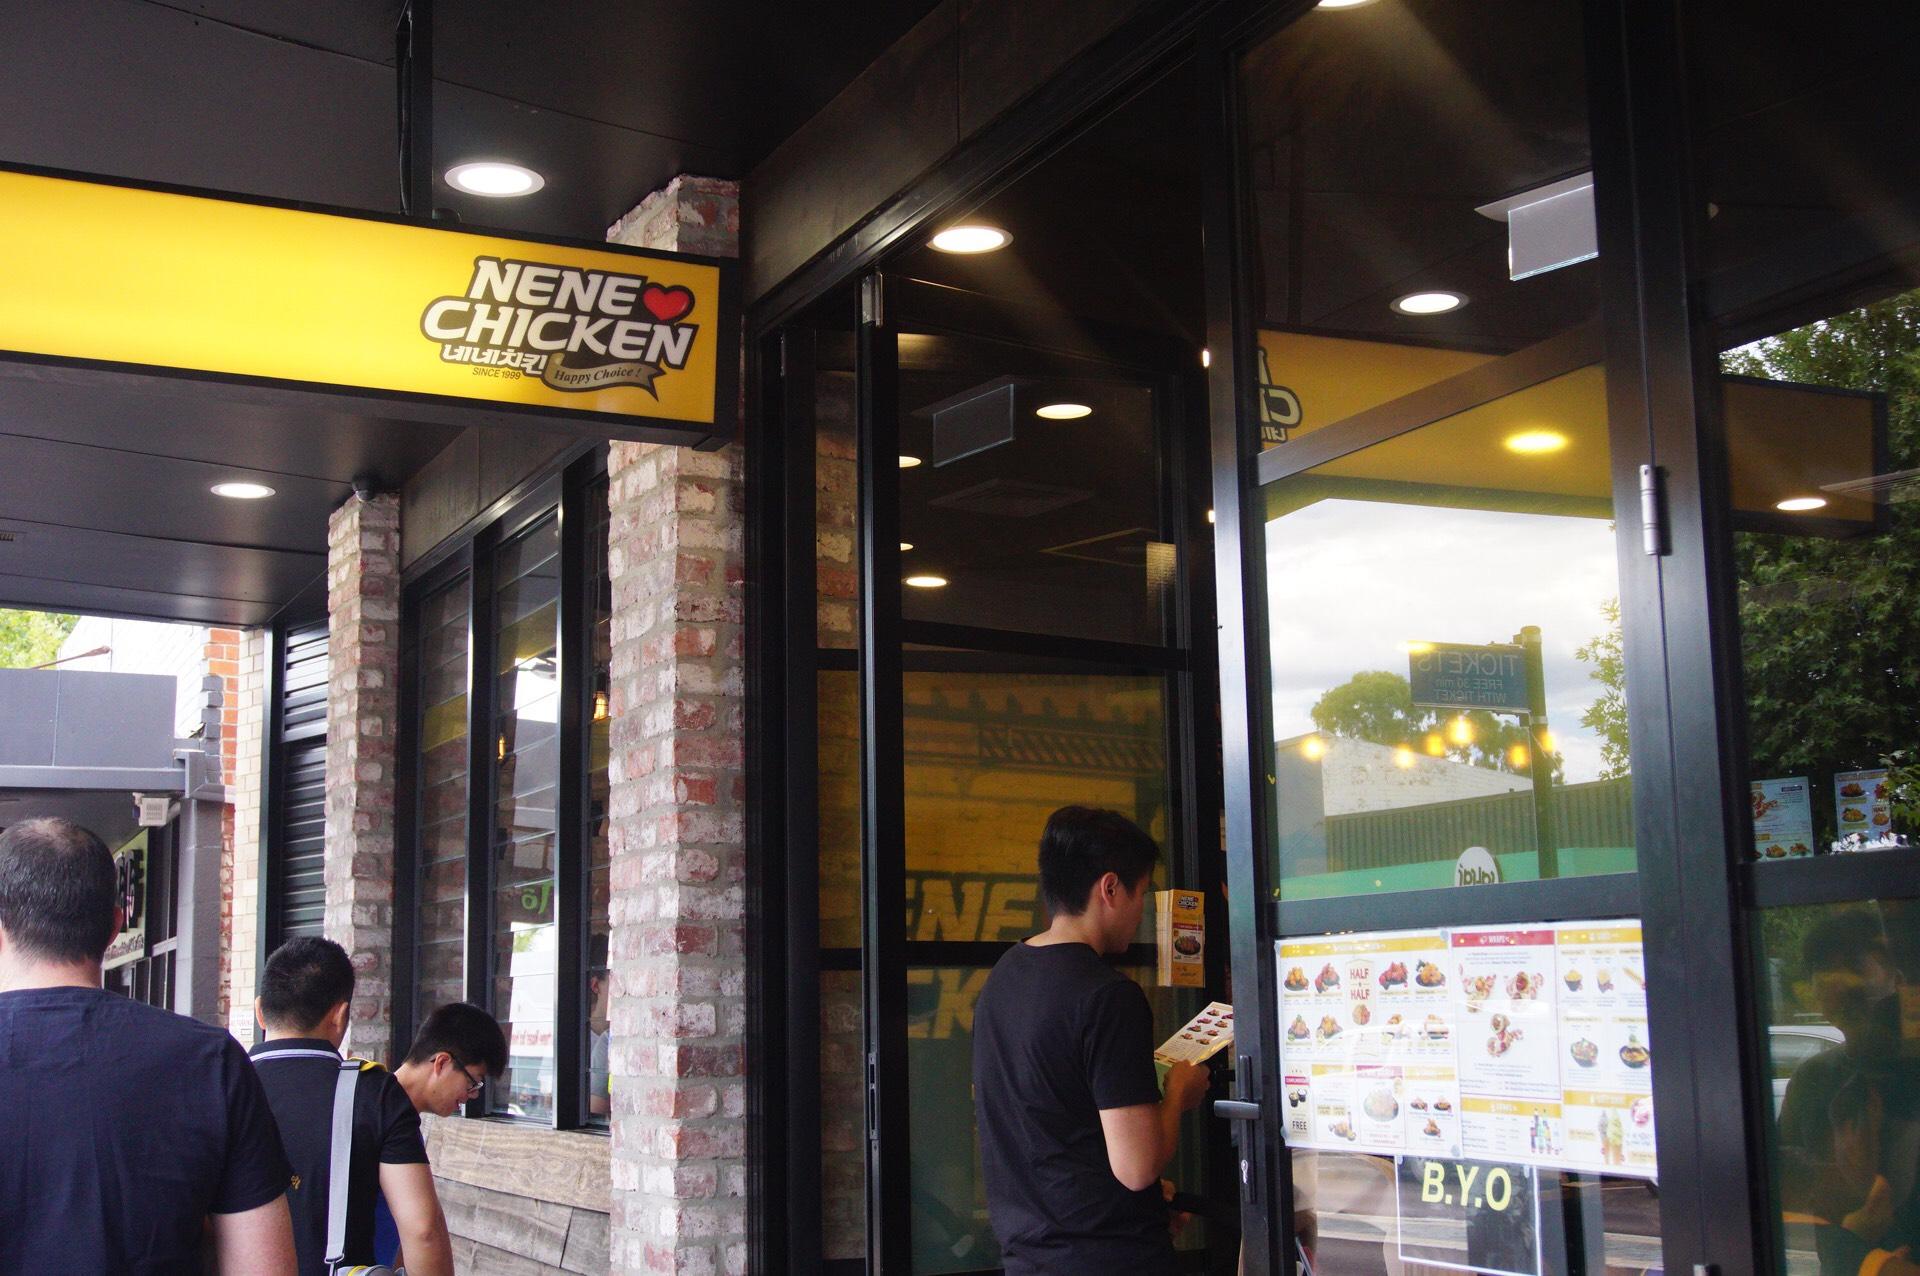 NeNe Chicken Vic Park